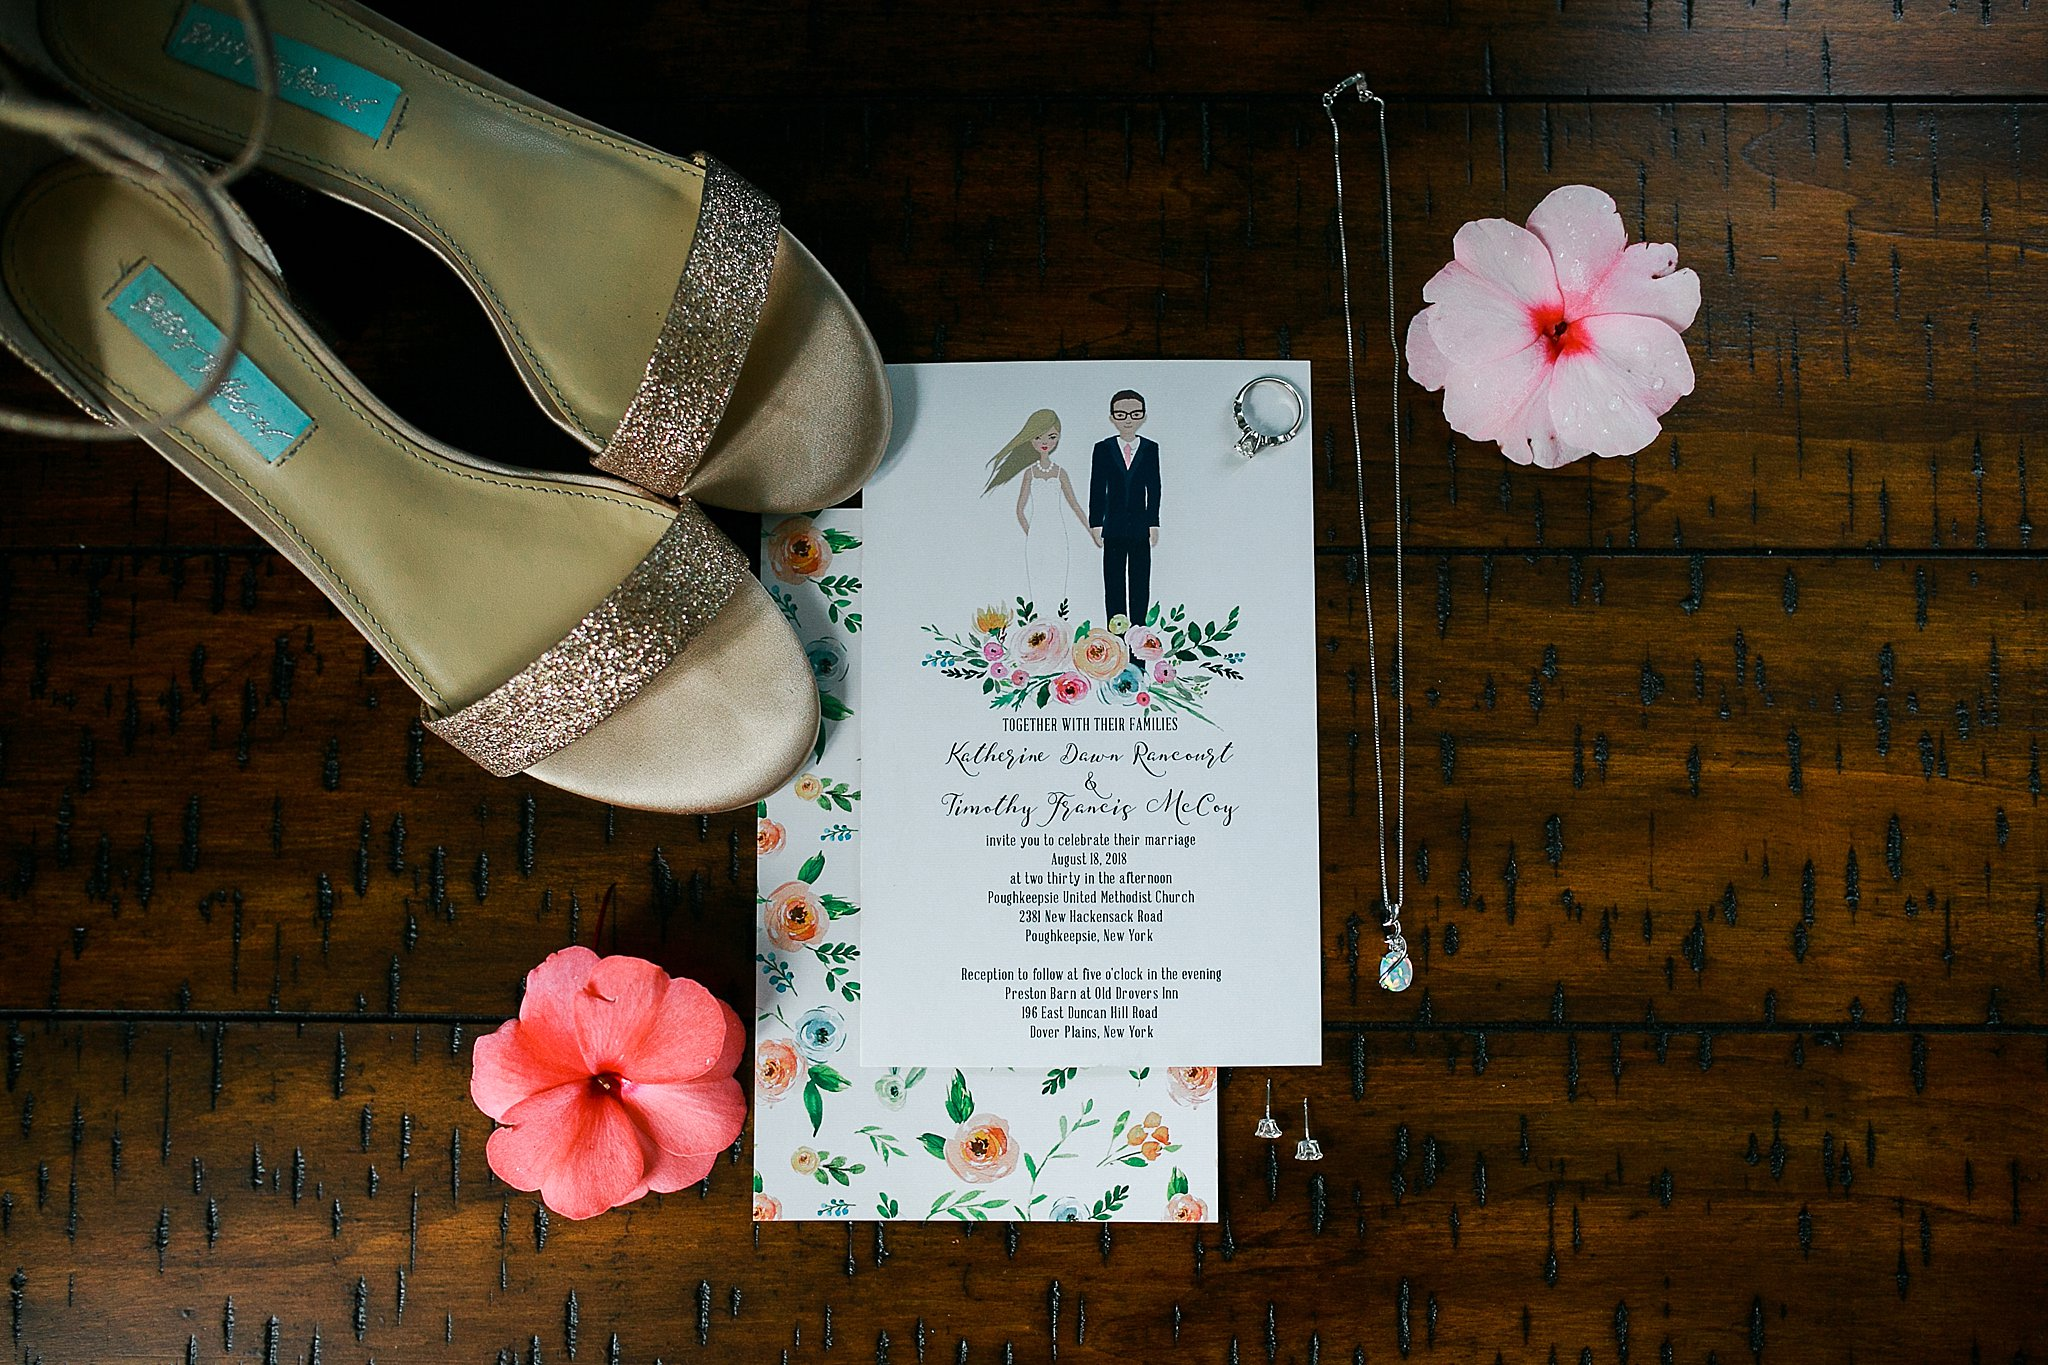 Preston Barn Old Drovers Inn Wedding Rustic Wedding Hudson Valley Photographer Sweet Alice Photography1.jpg